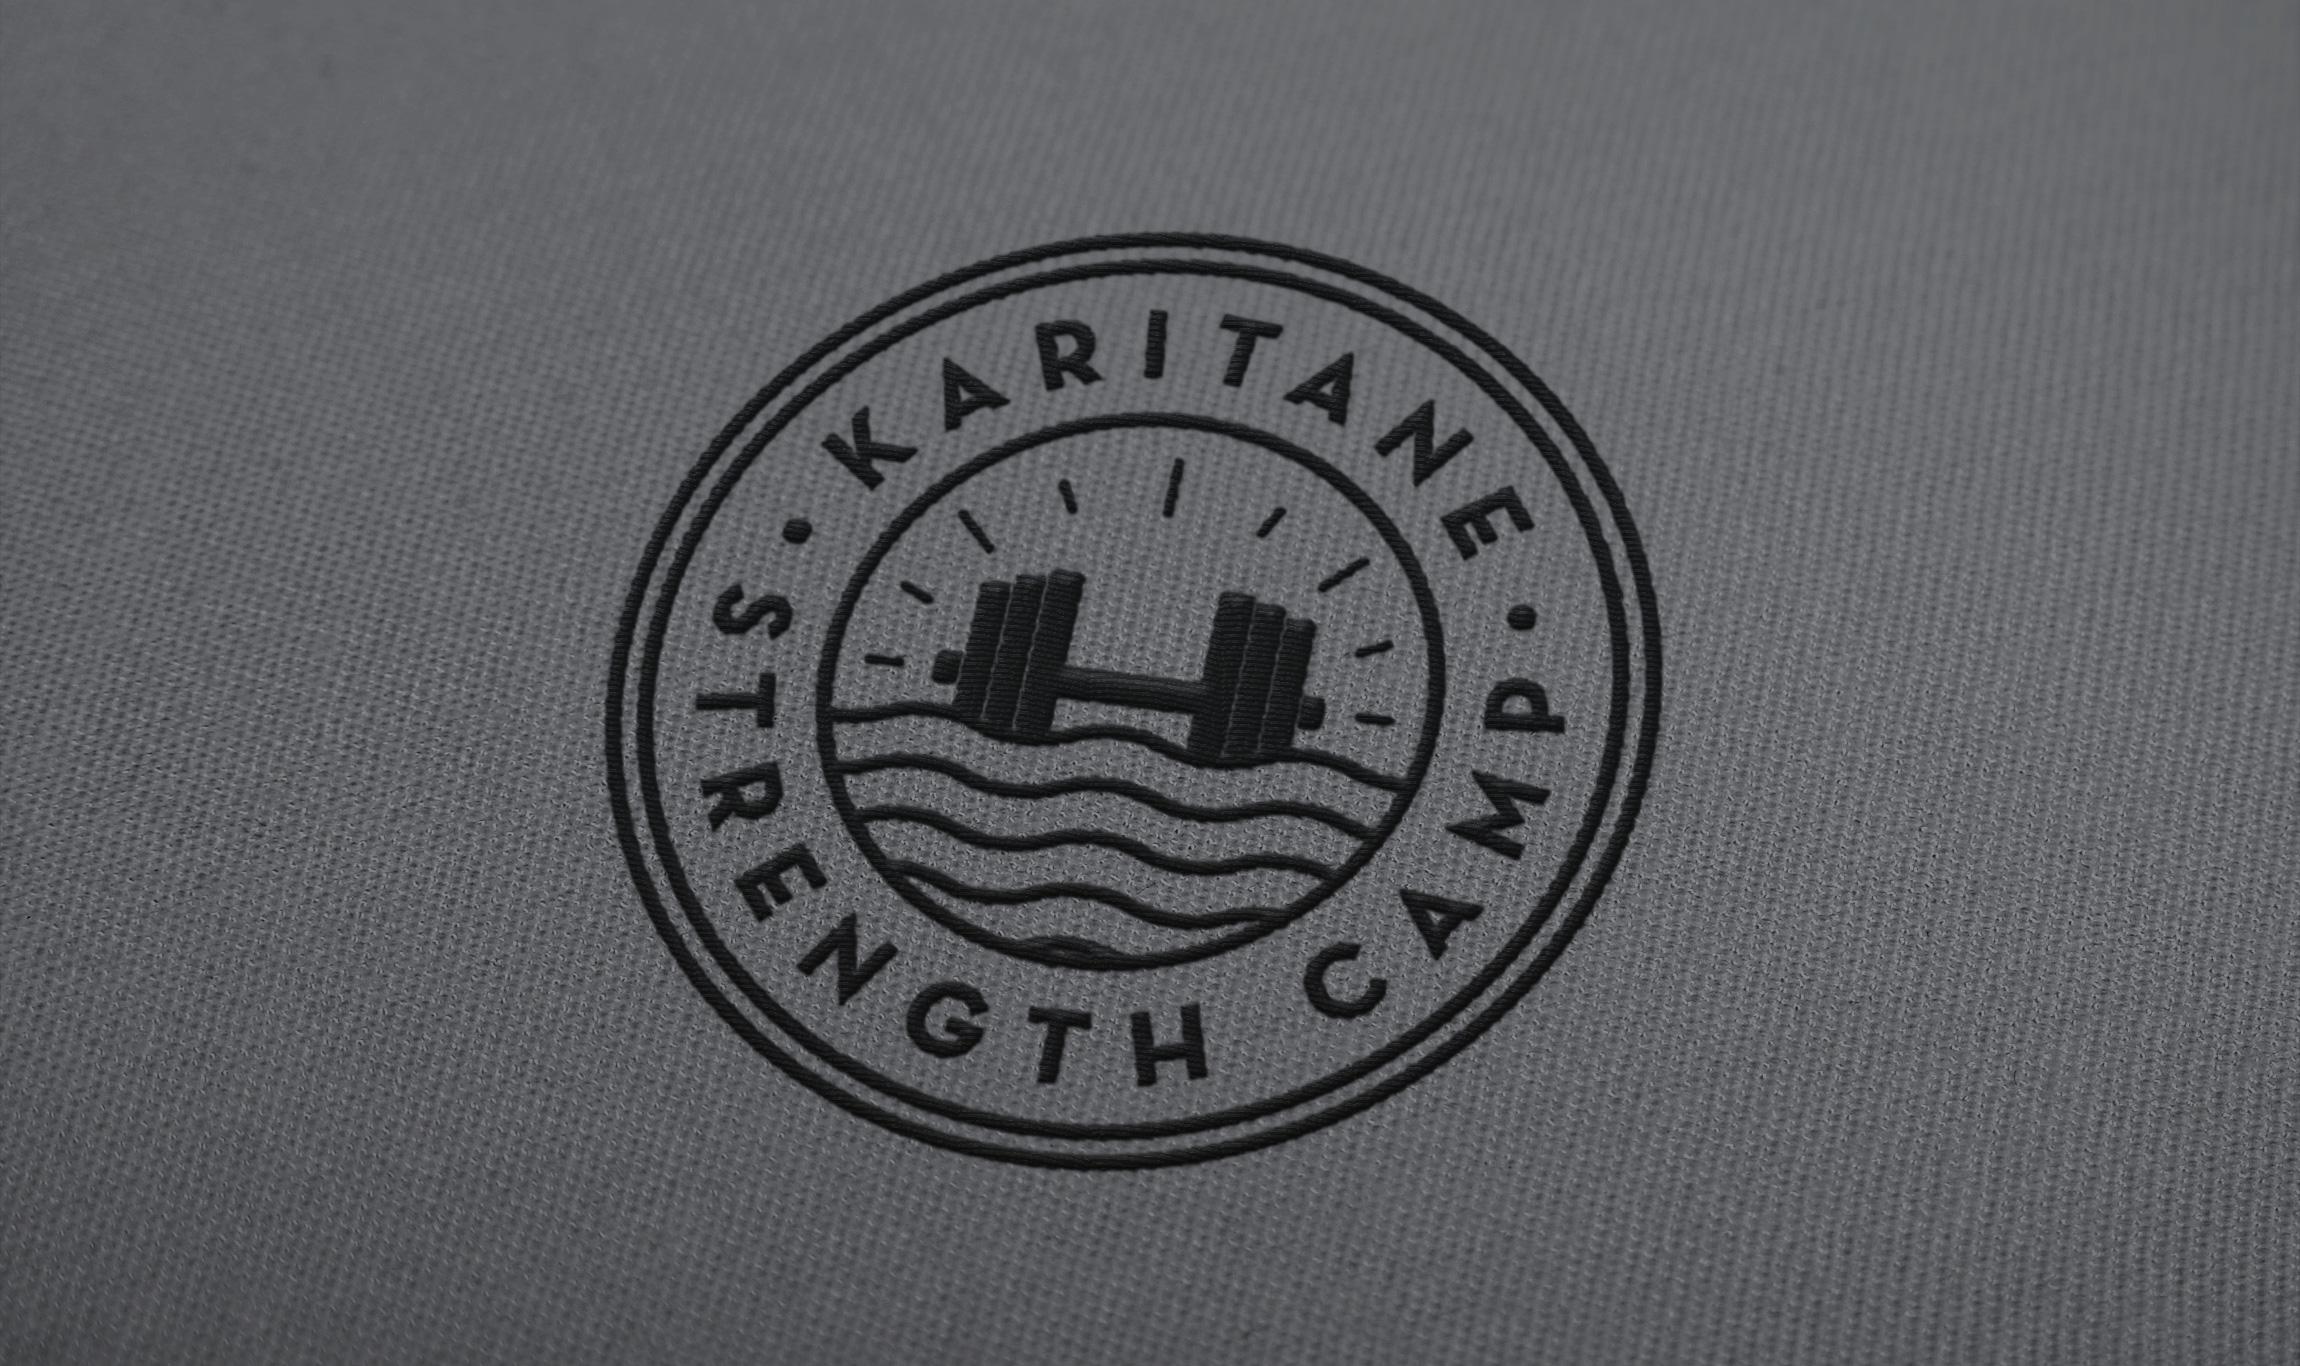 karitane strength camp finn gallagher